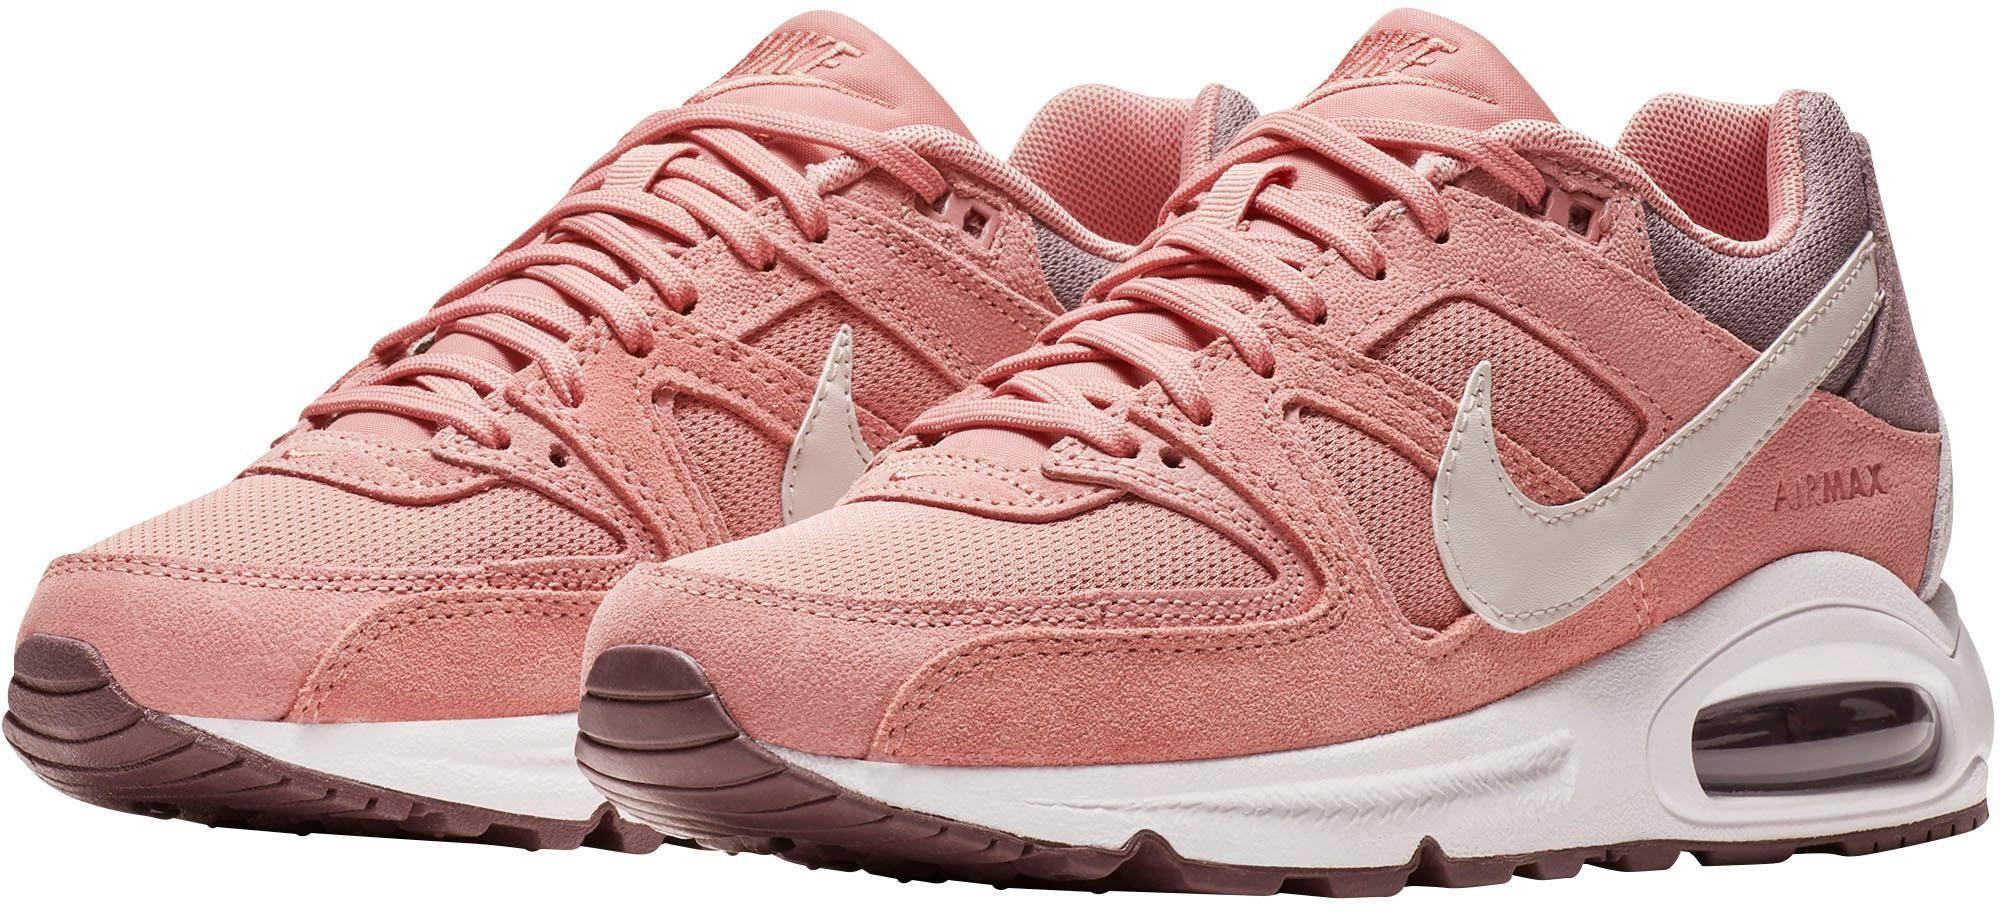 Nike Sportswear »Wmns Air Max Command« Sneaker | OTTO